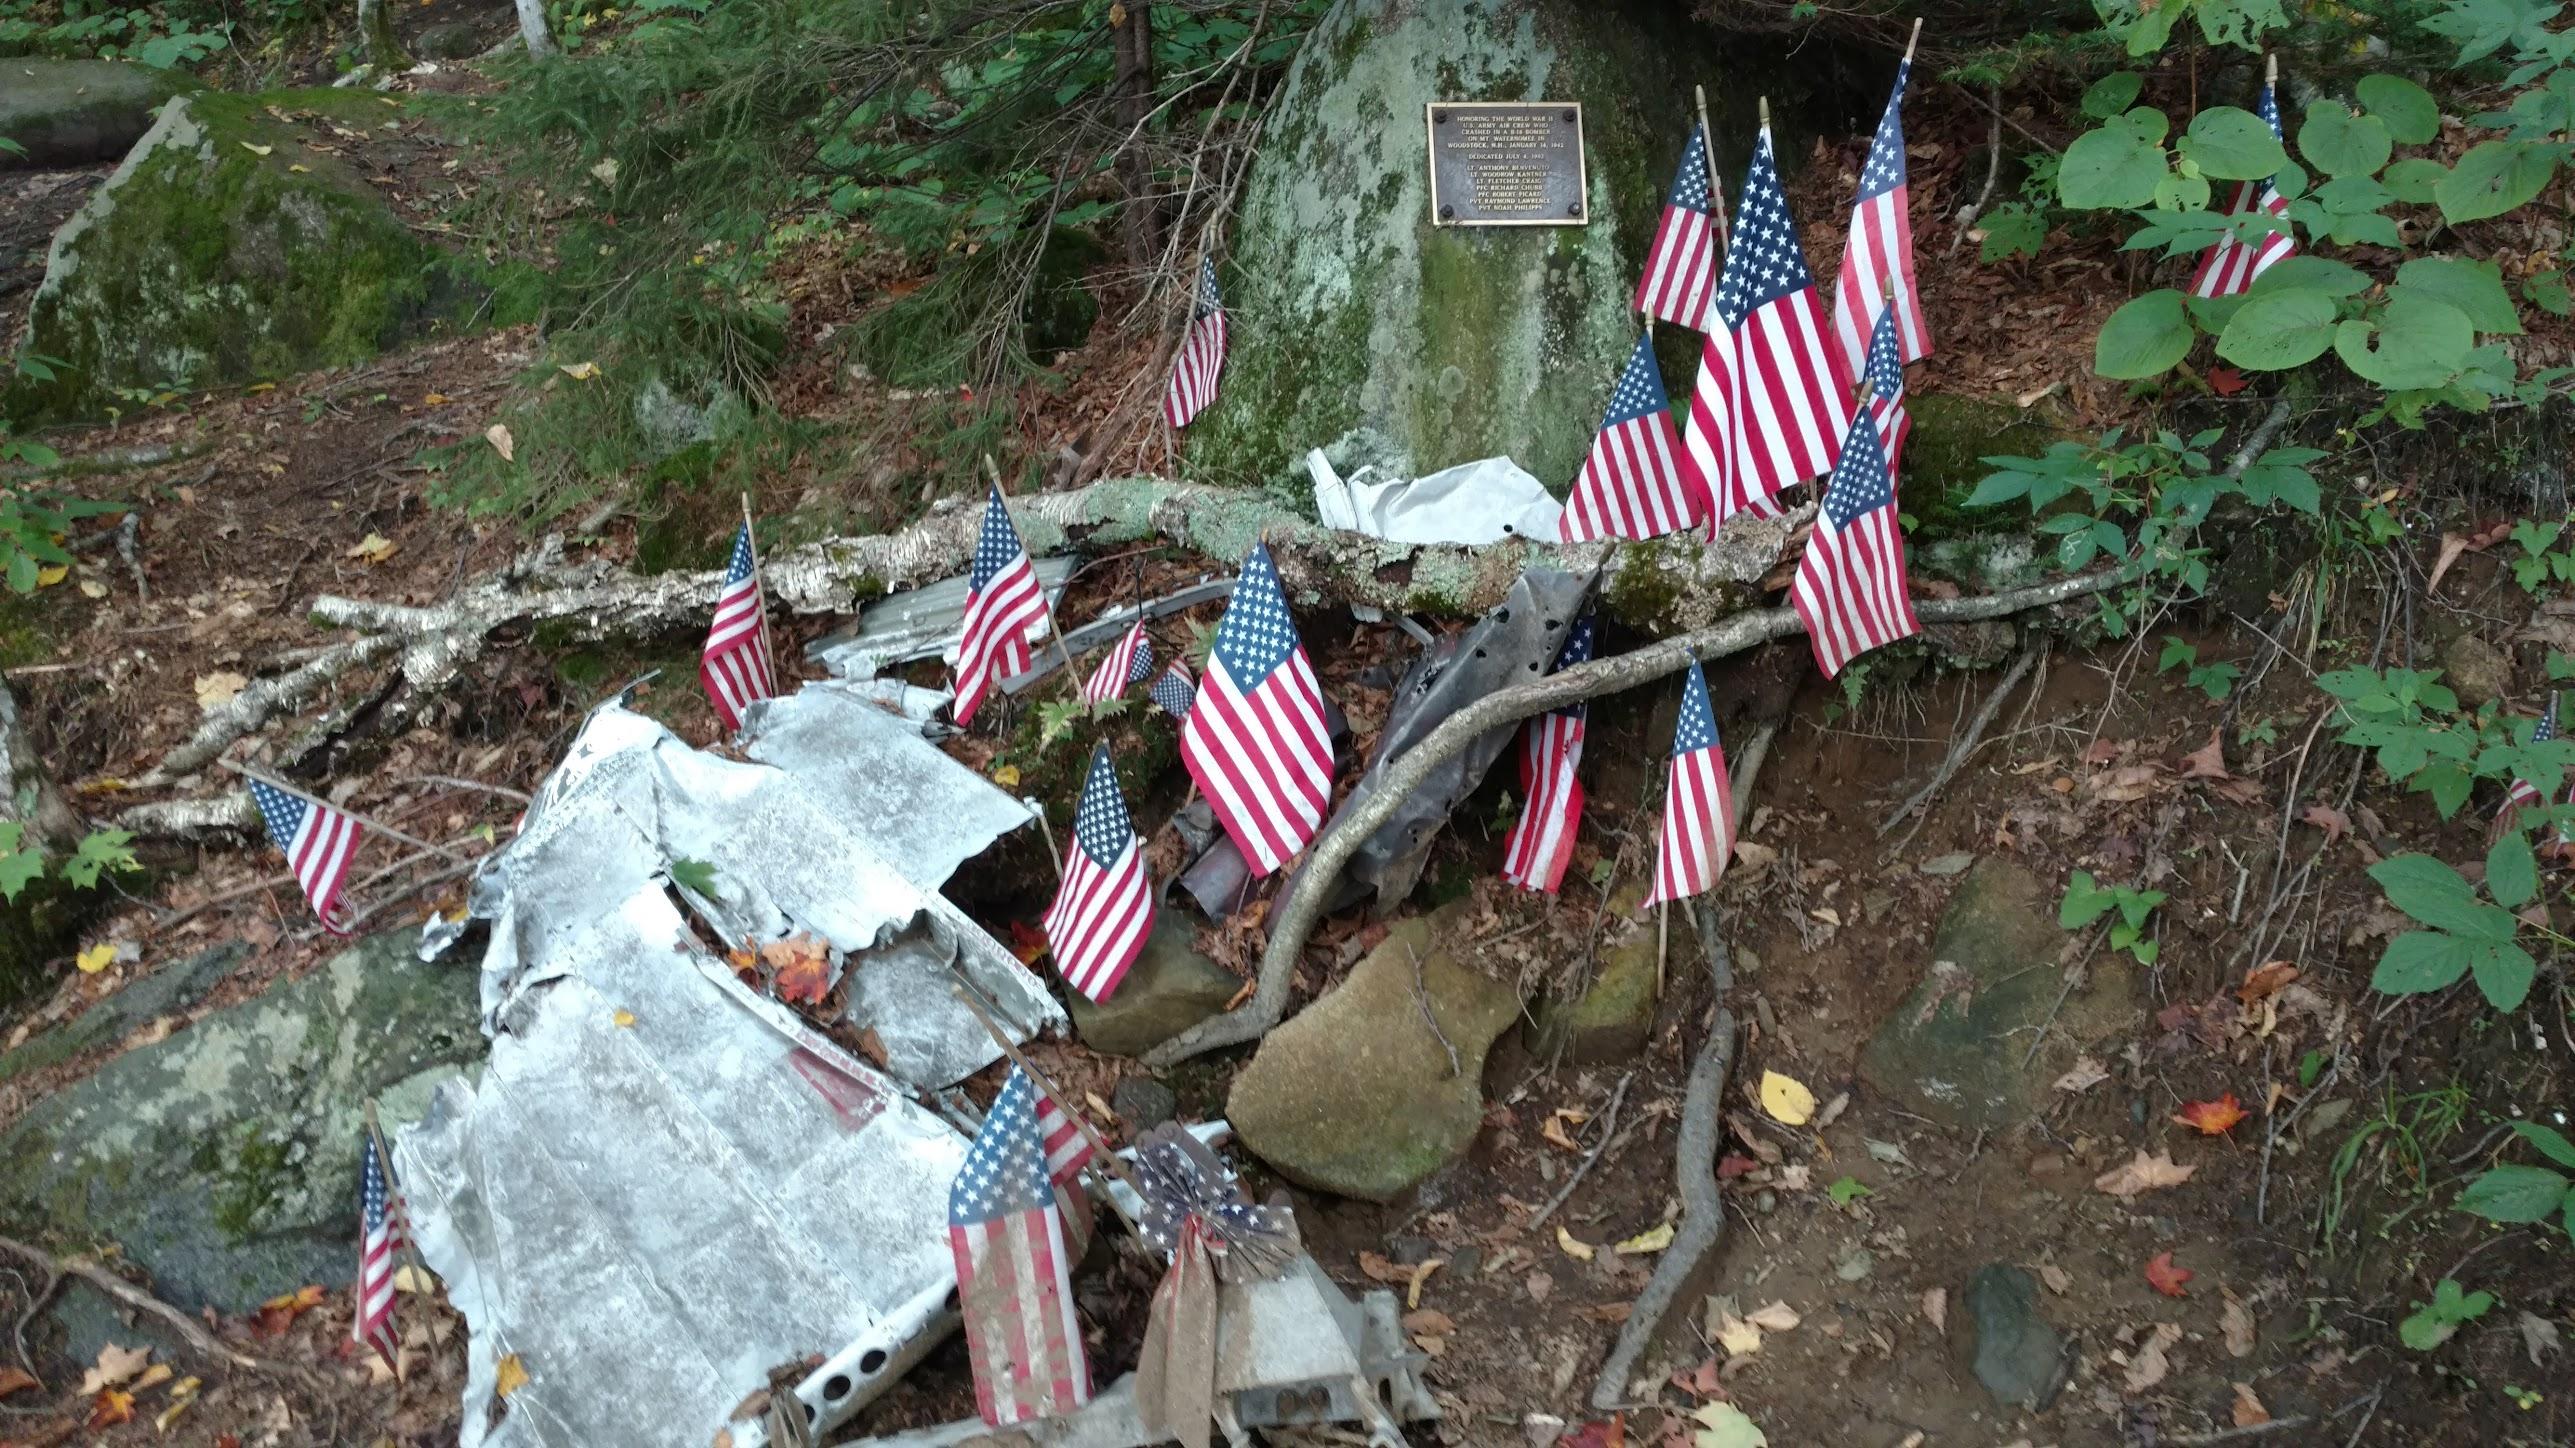 Off on Adventure: Hike to Douglas B-18 Bomber Crash - Mount